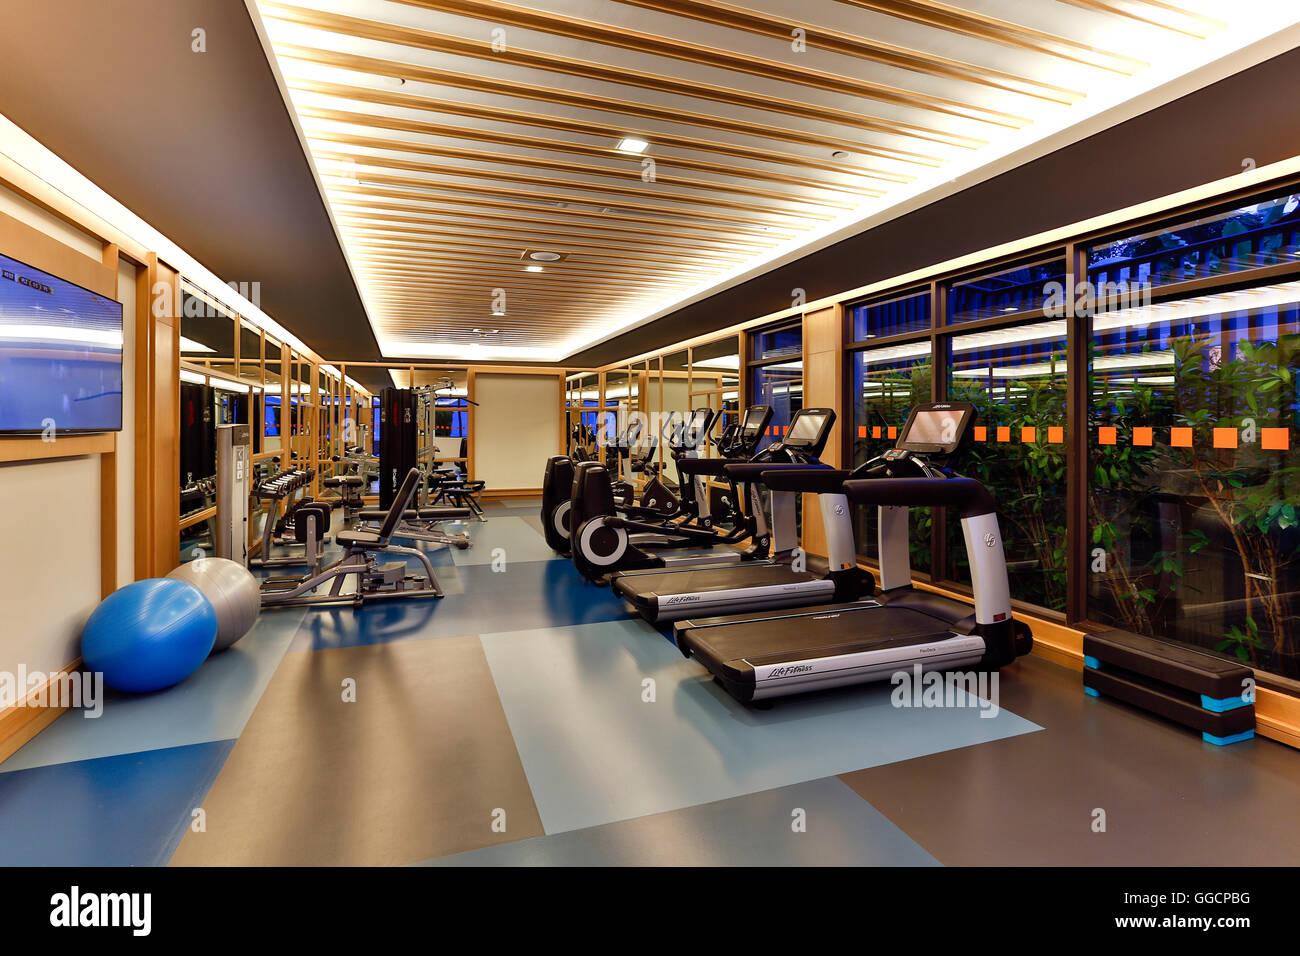 Health Club fitness center situado en el Amari Phuket en Patong Beach, Phuket, Tailandia. Imagen De Stock